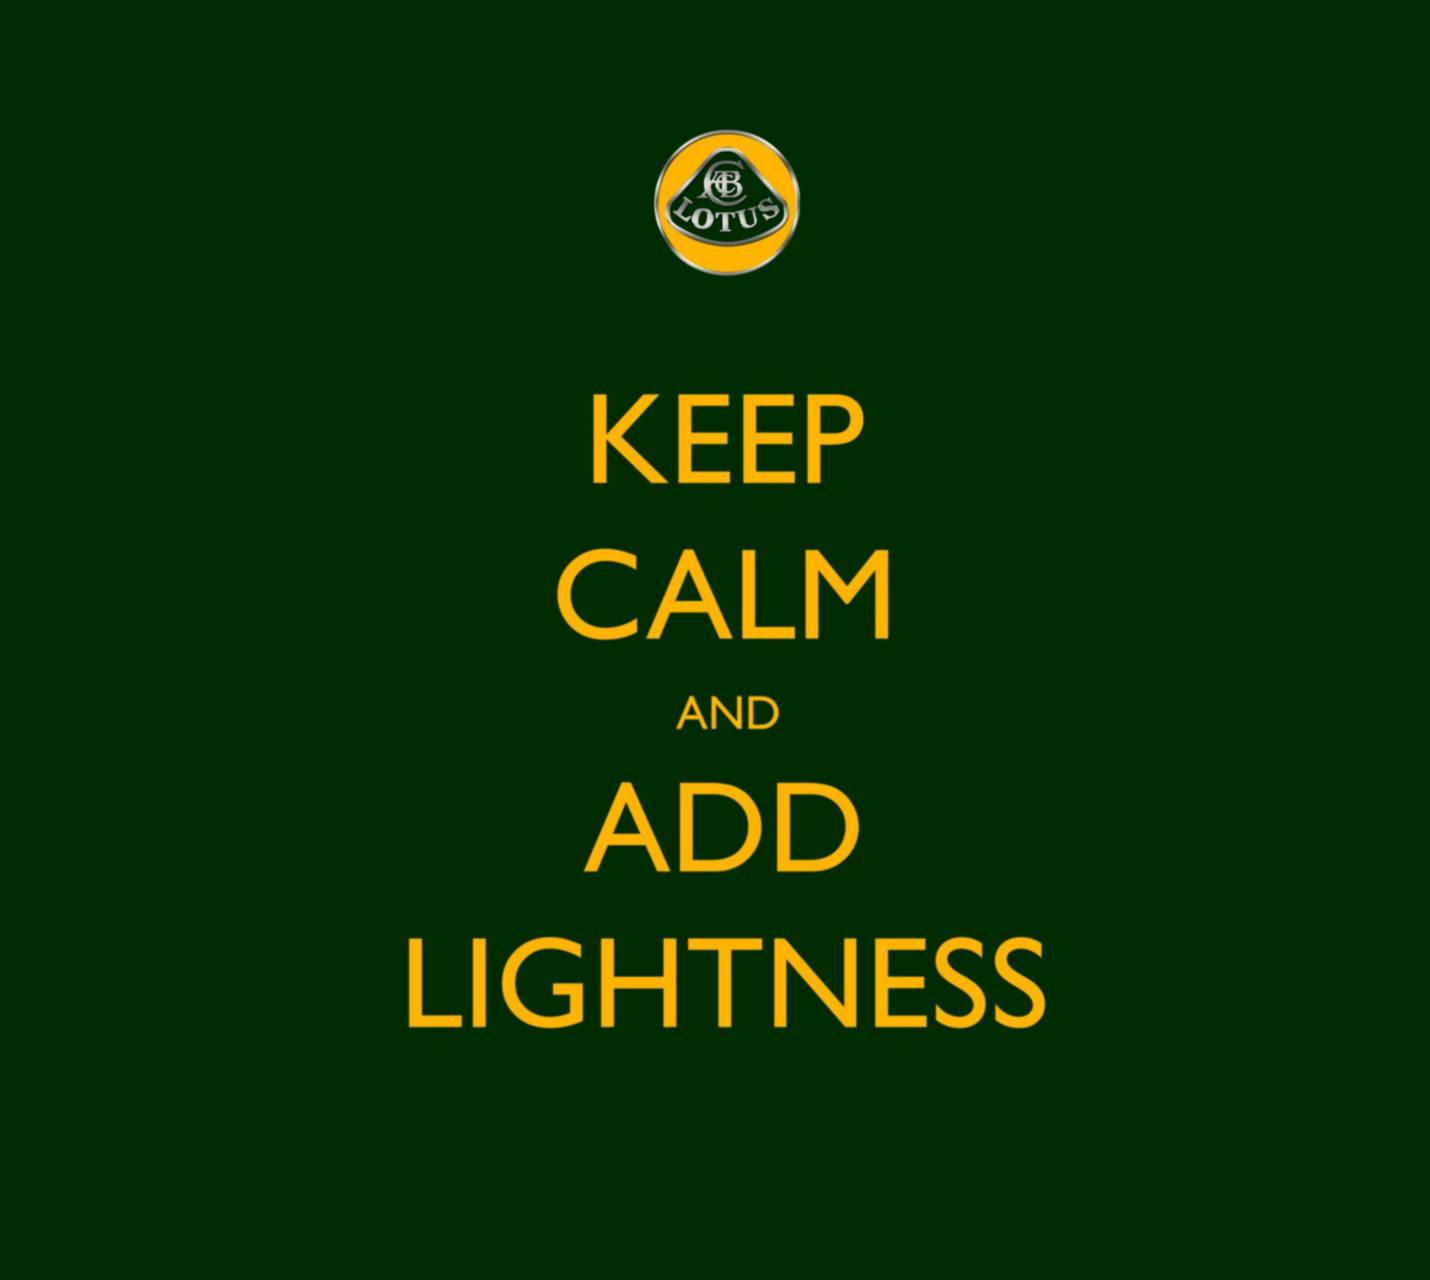 Lotus Keep Calm